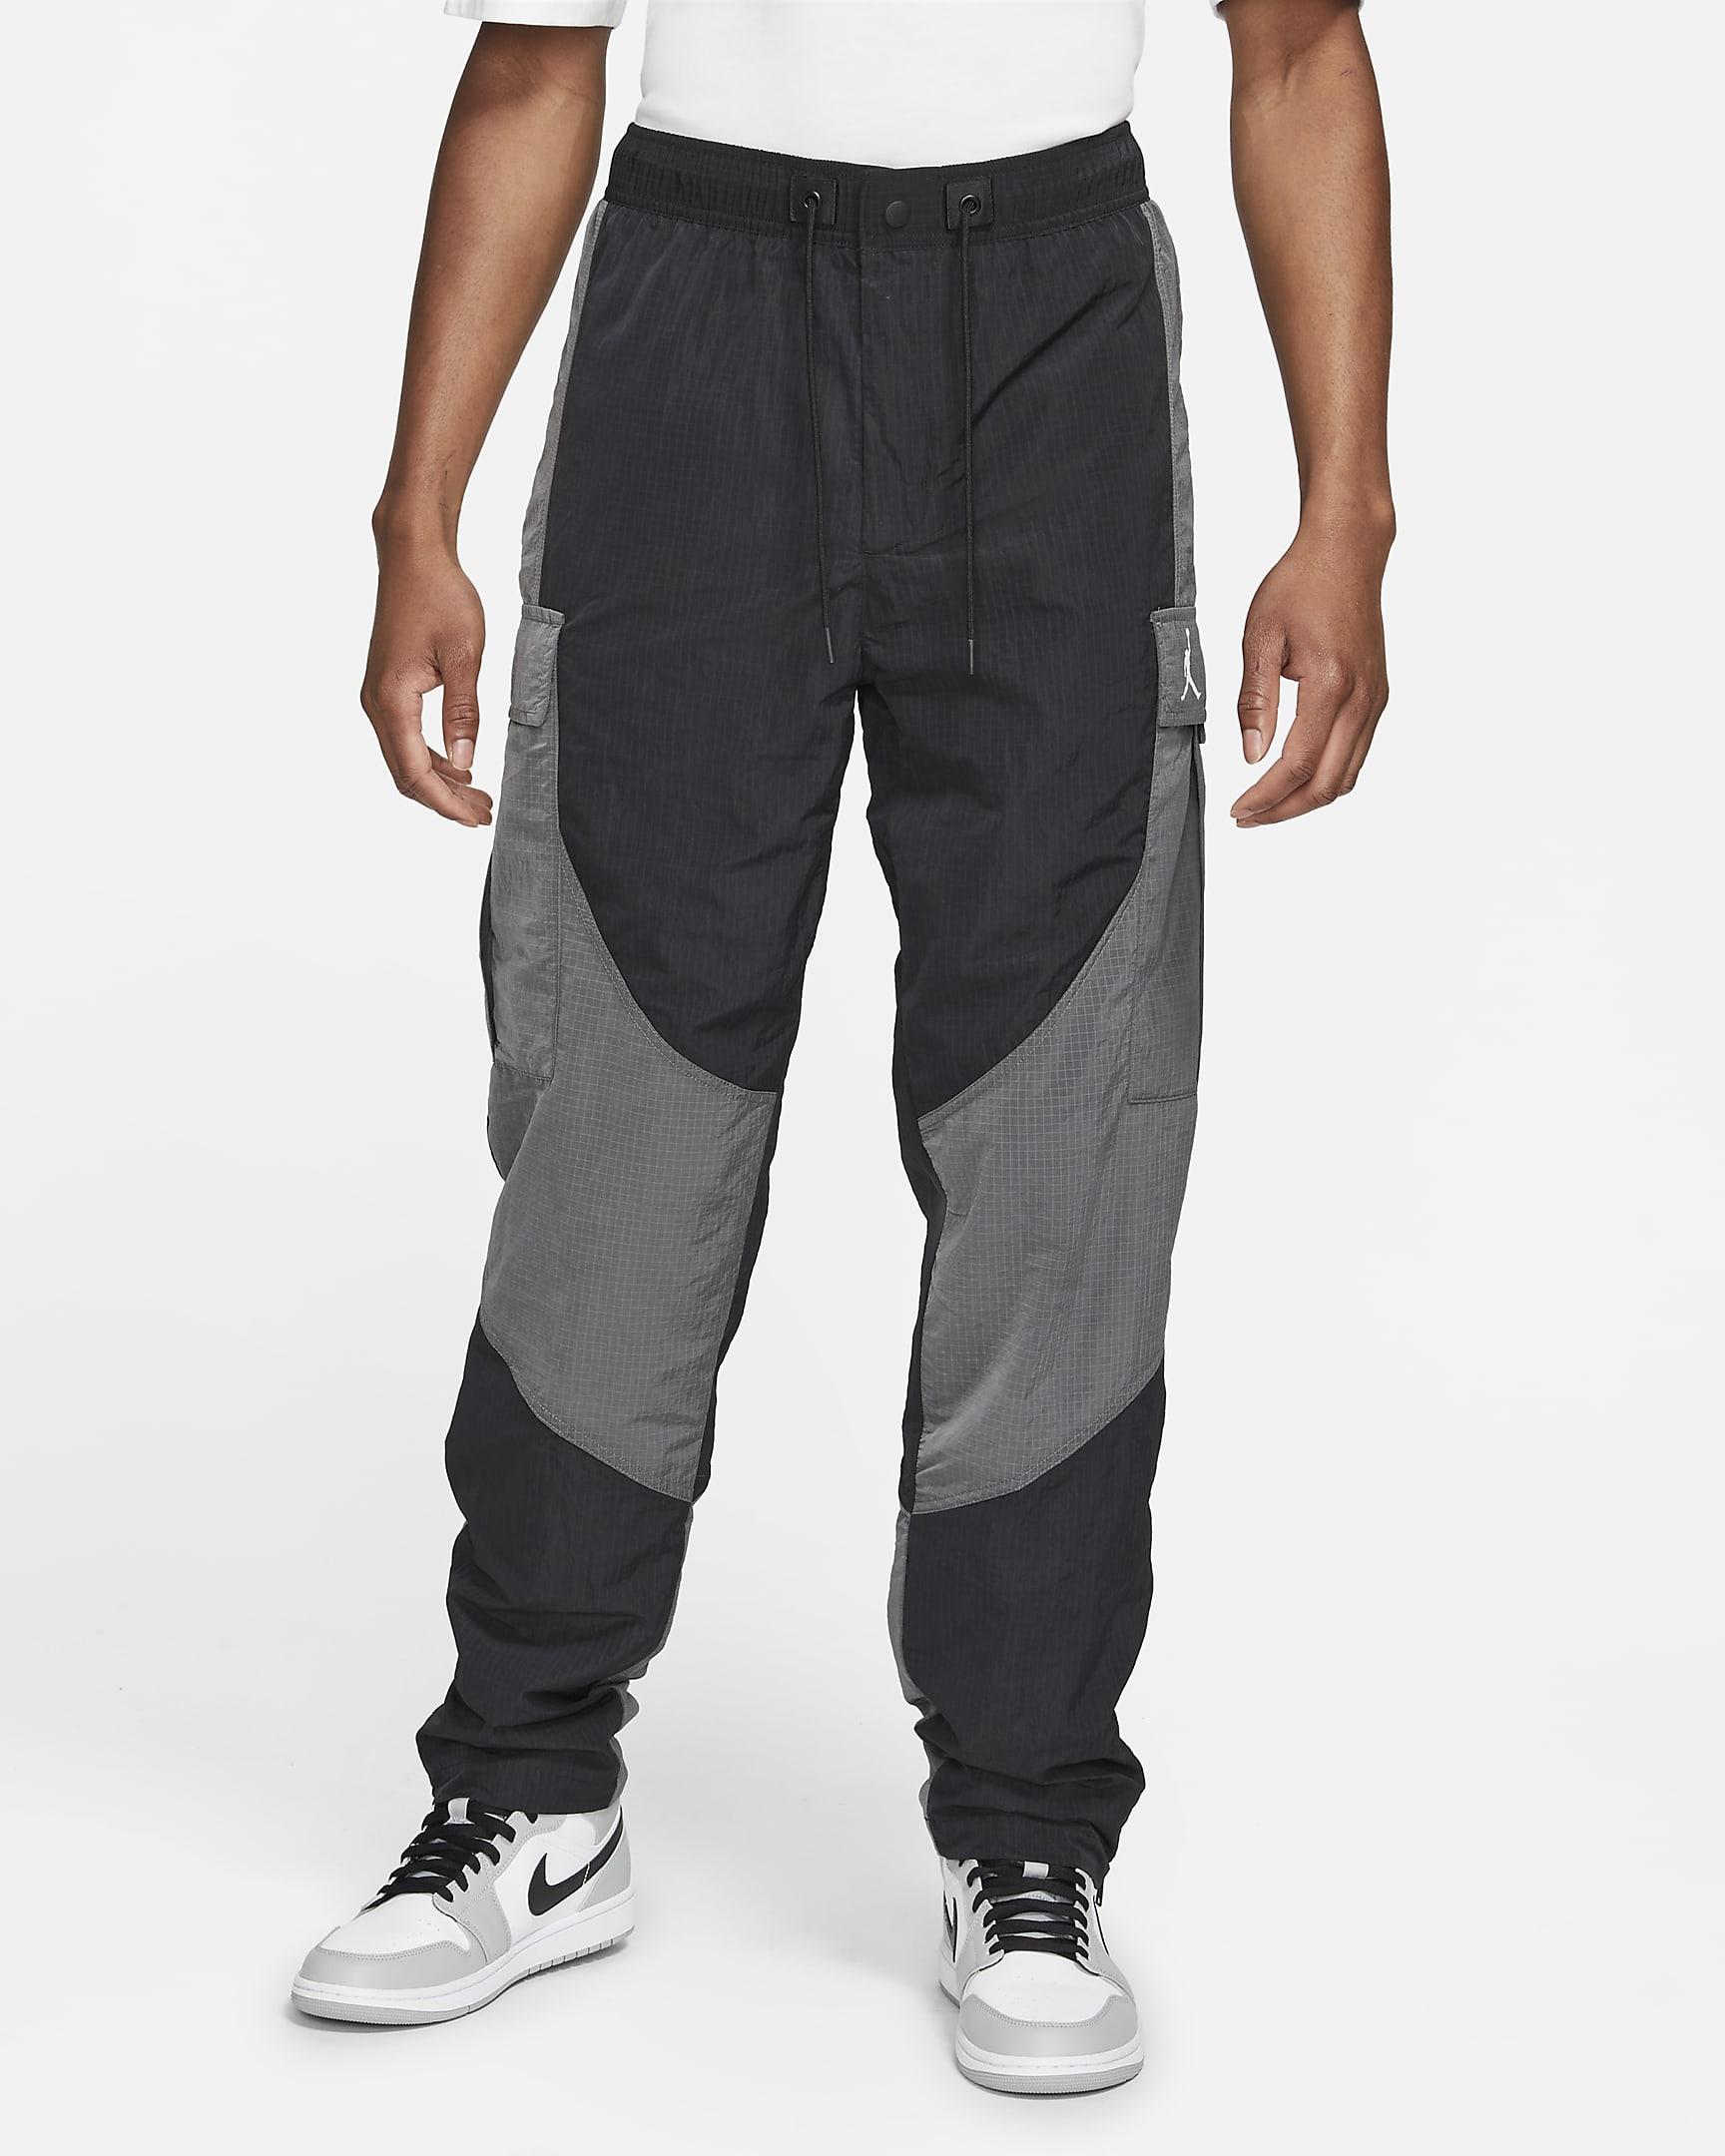 jordan-23-engineered-mens-woven-pants-dr02bG.png